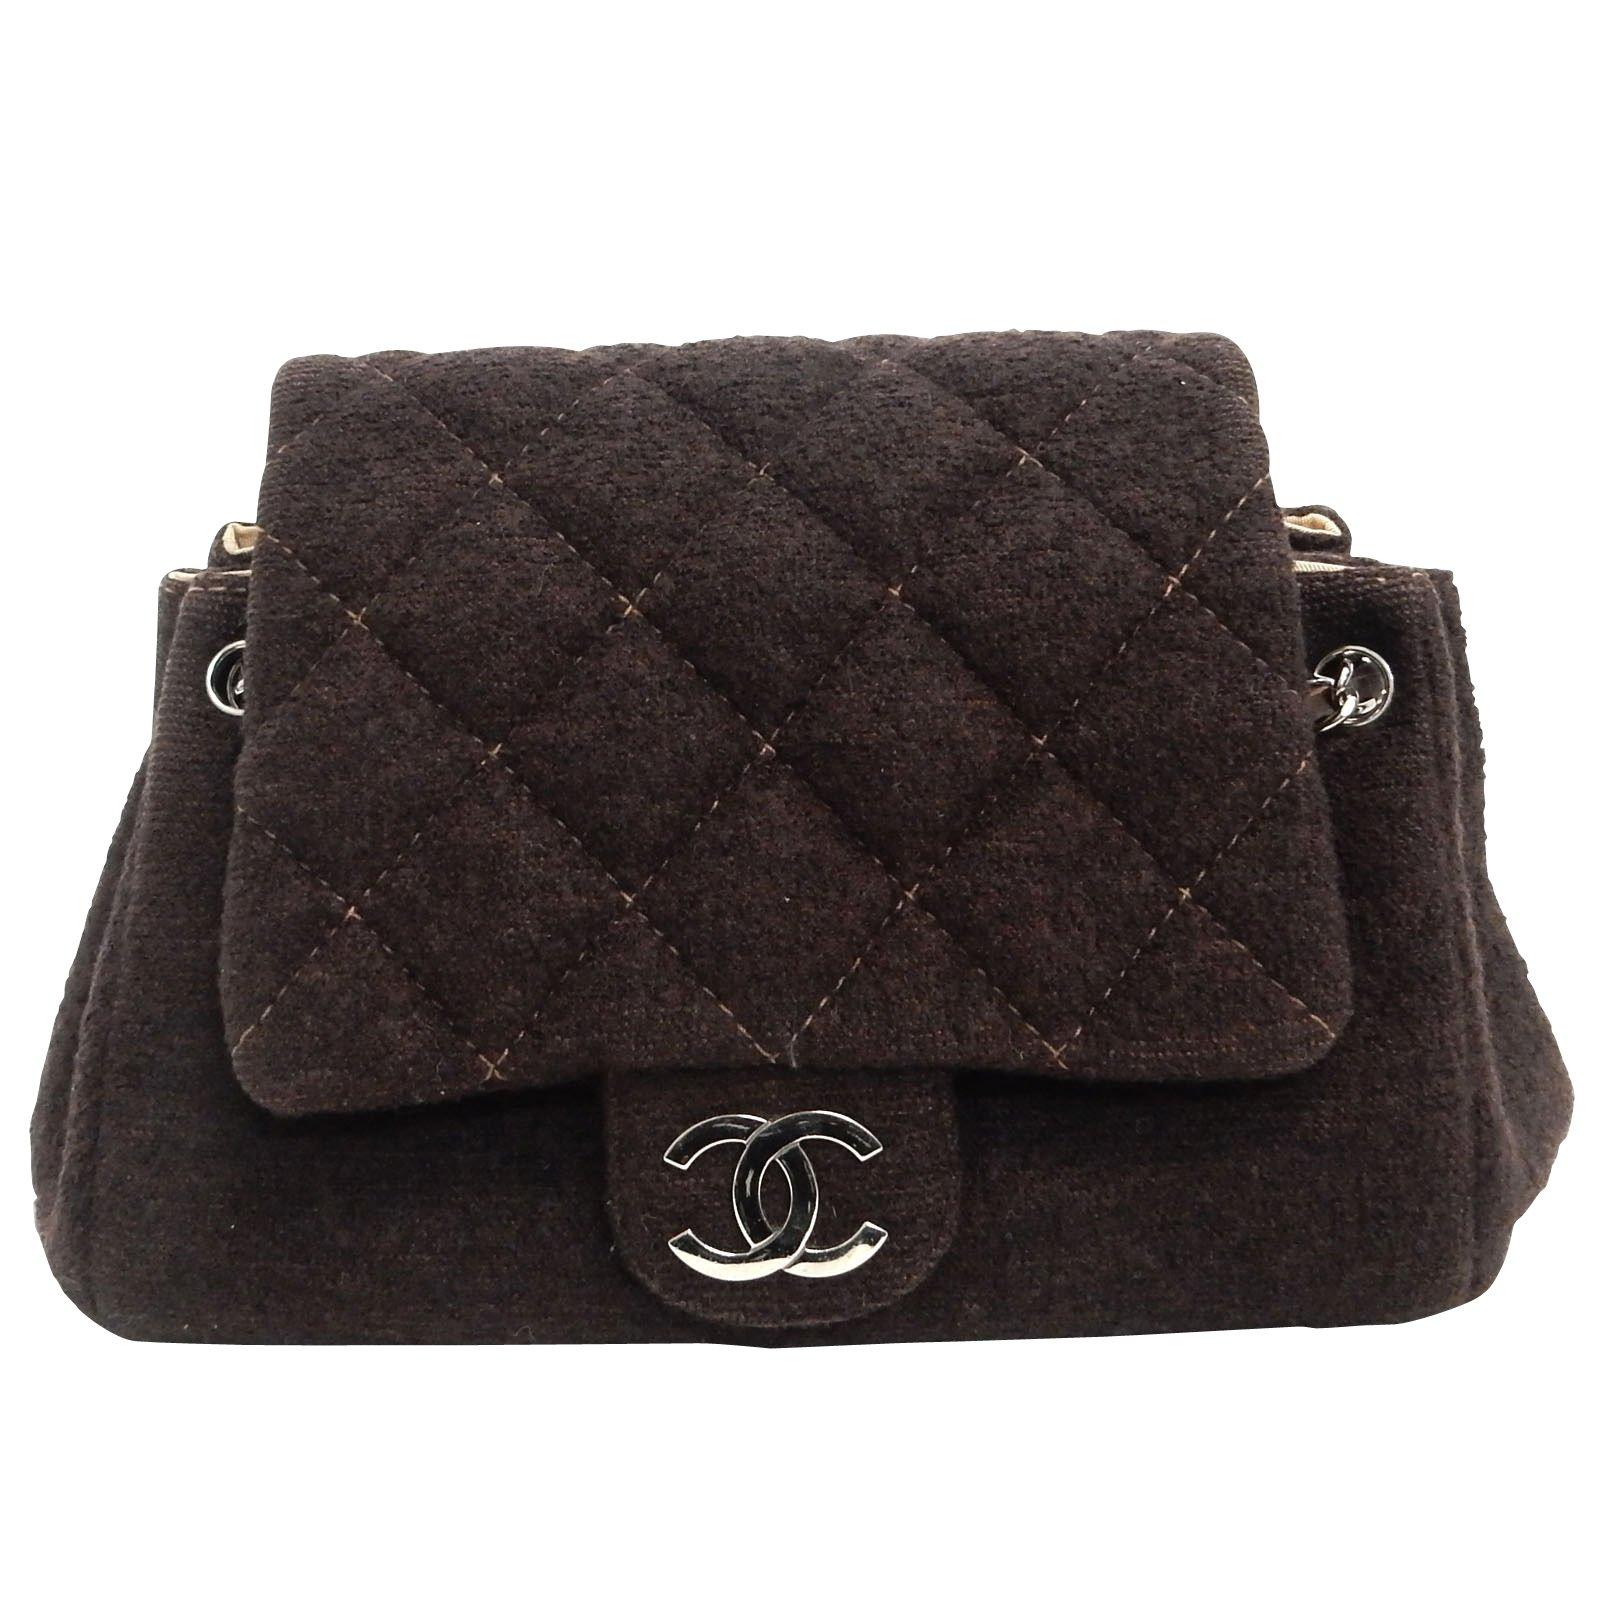 c1e814009427 Chanel Tweed Dark Brown Handbags Tweed Brown ref.86804 - Joli Closet